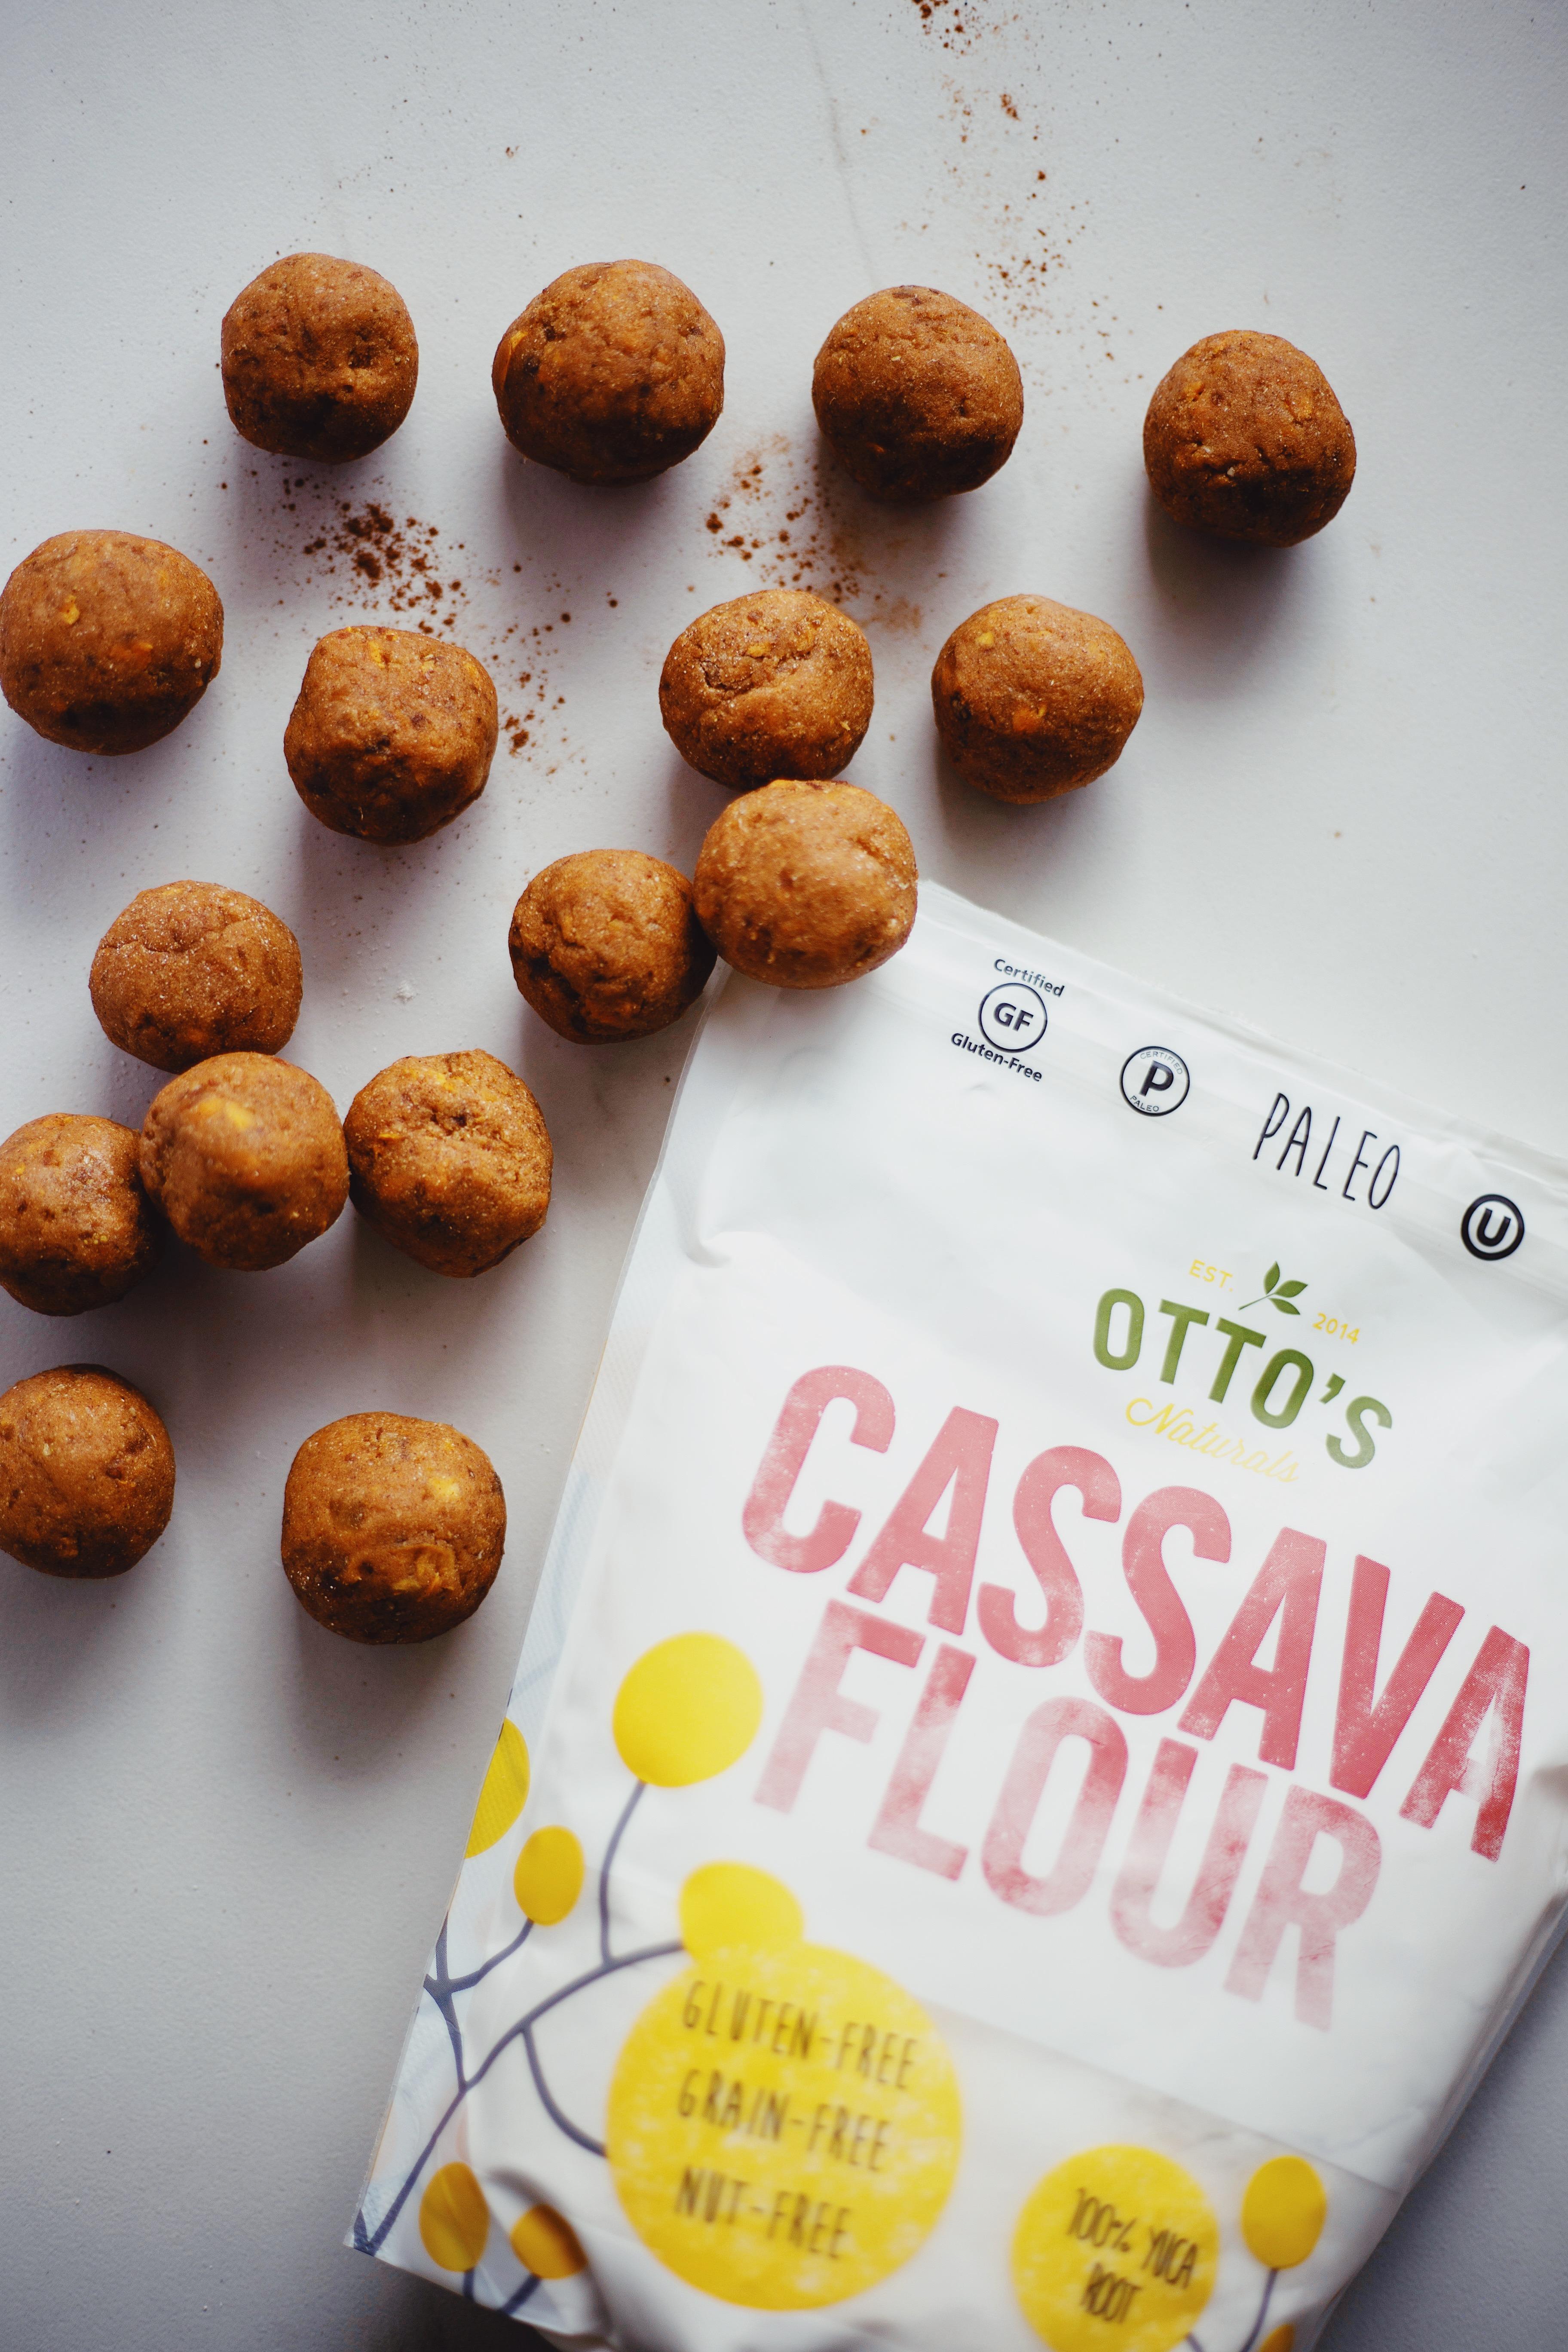 Cassava flour balls recipe